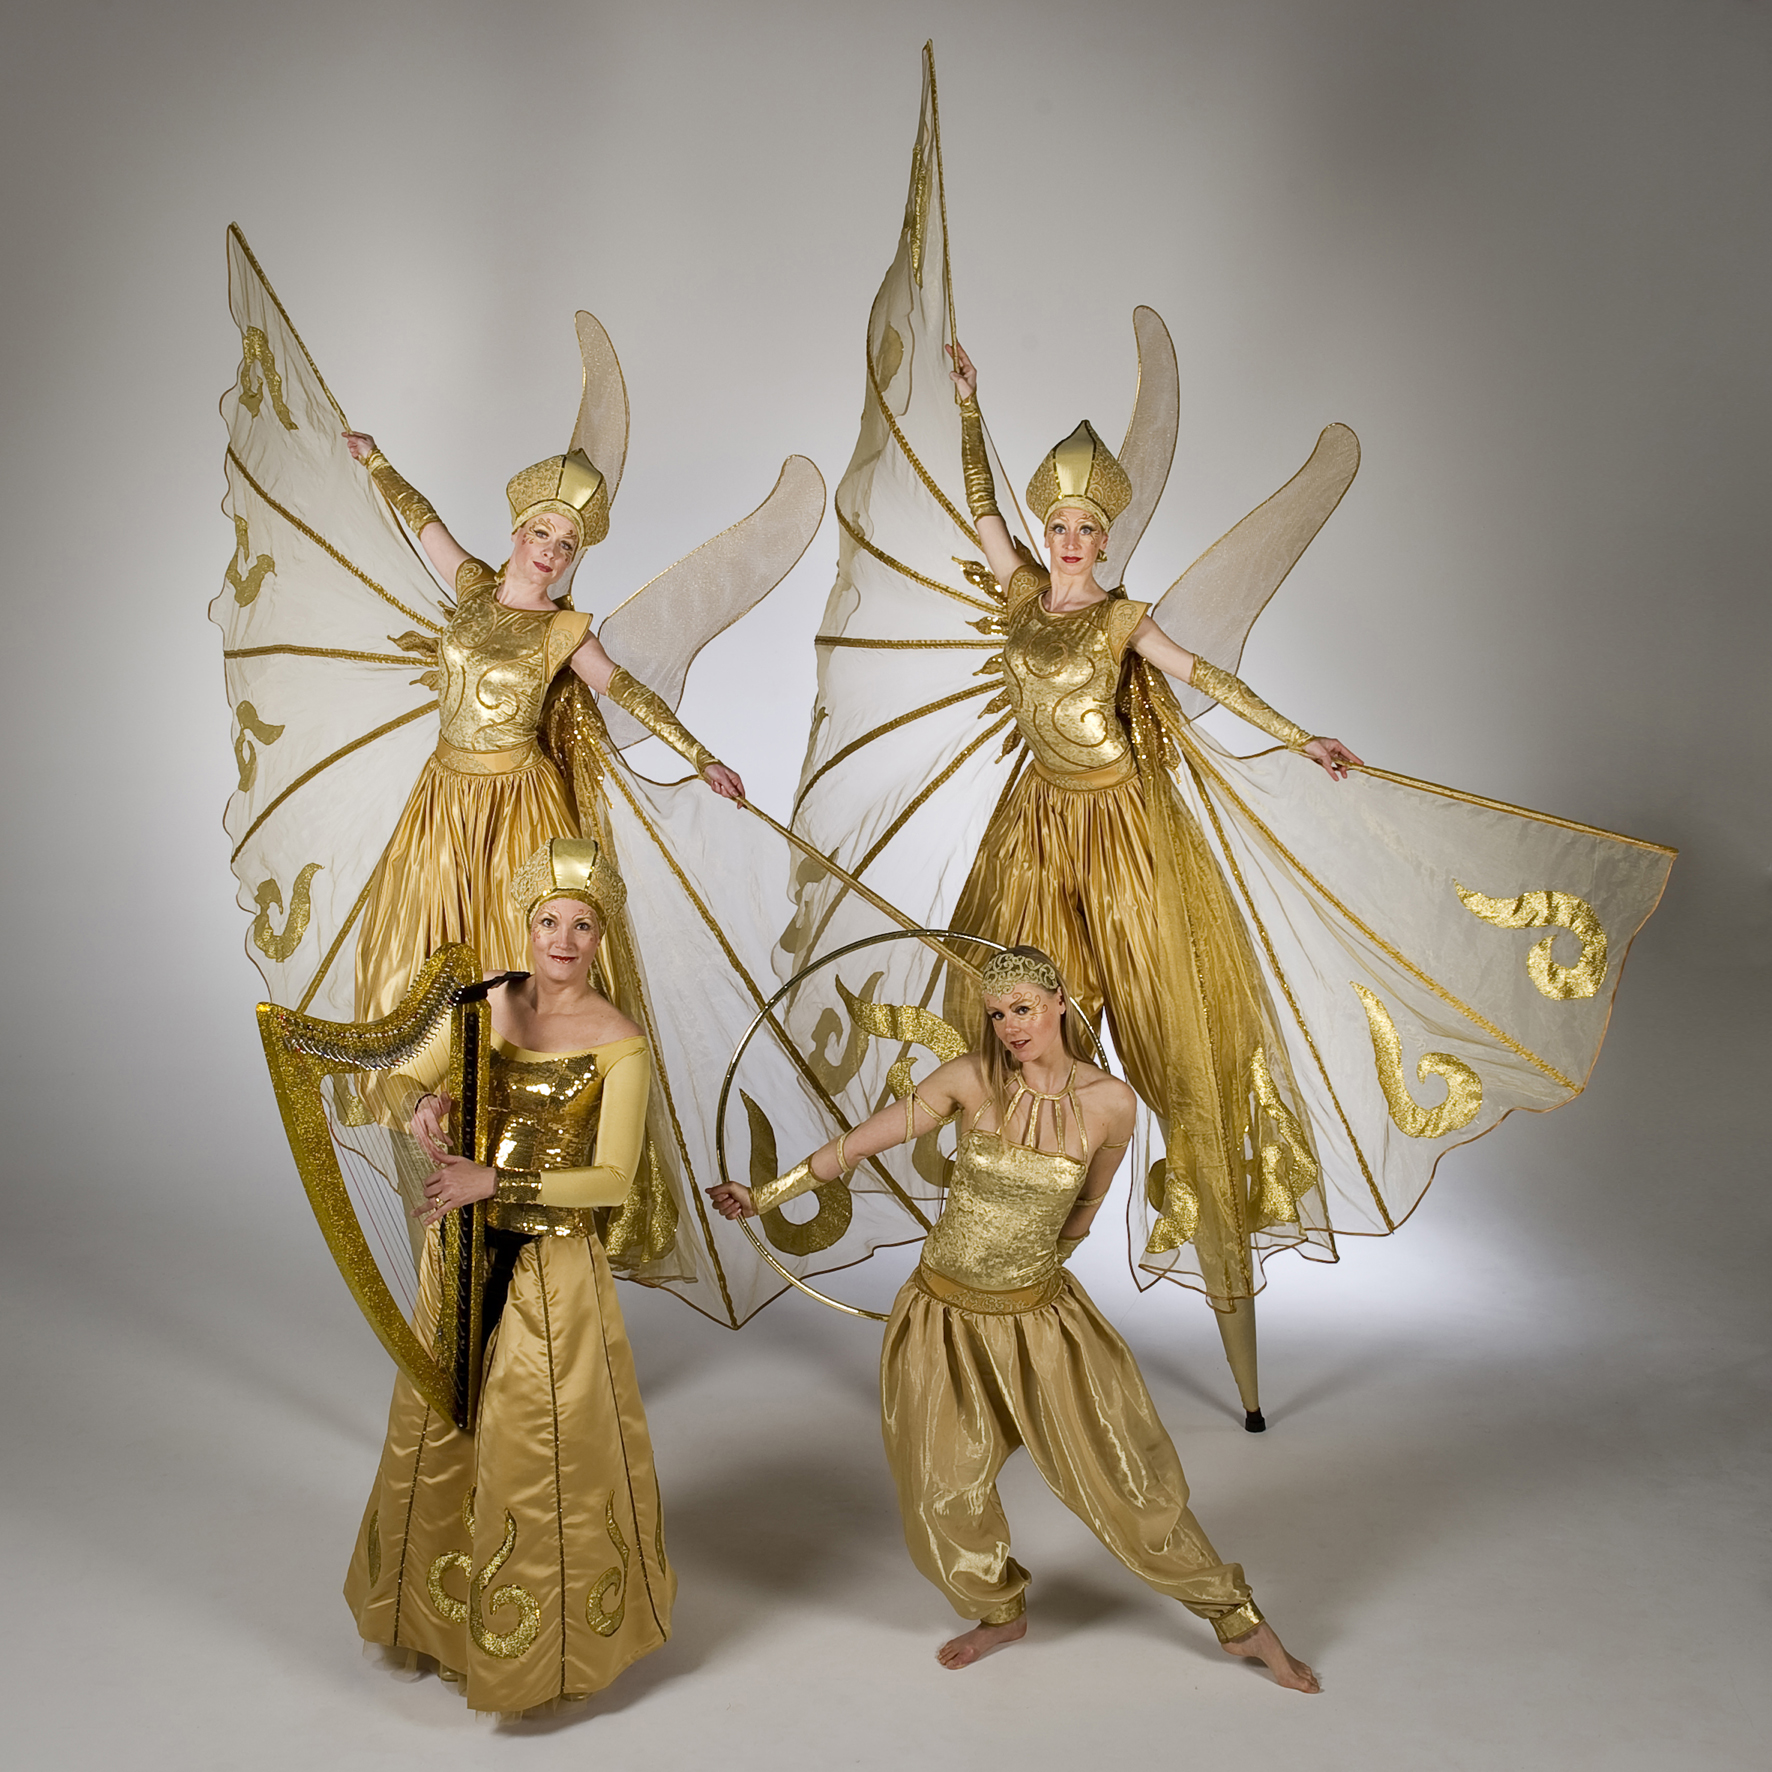 Hofbogen ondernemer: PaSSar Performing Arts, nektar (group) 1a